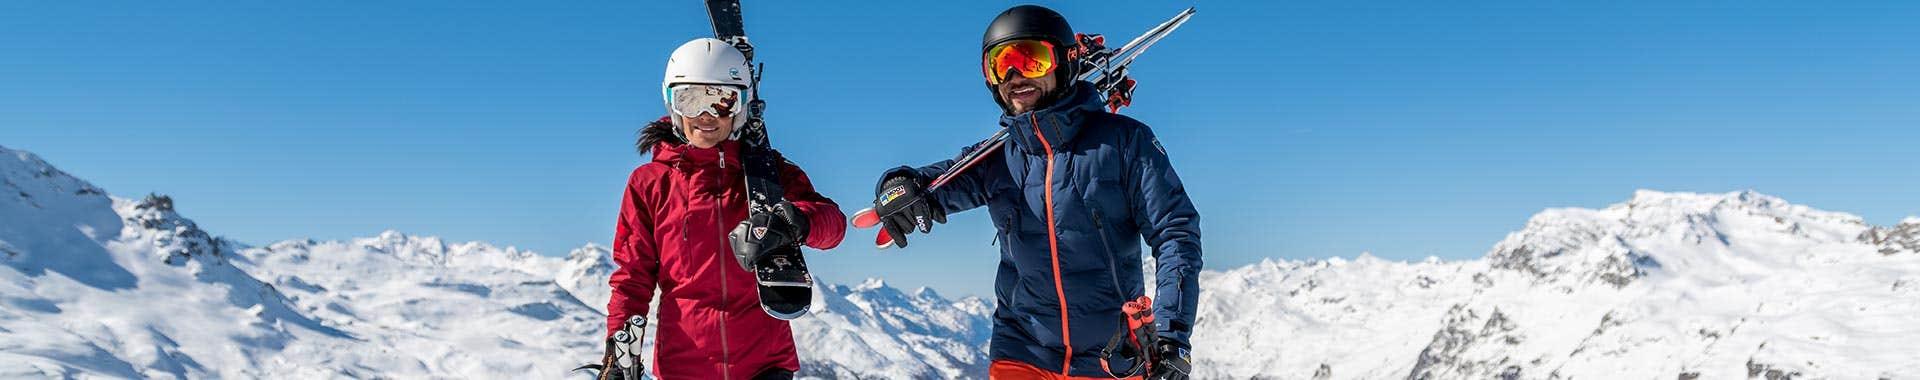 Accessoires ski